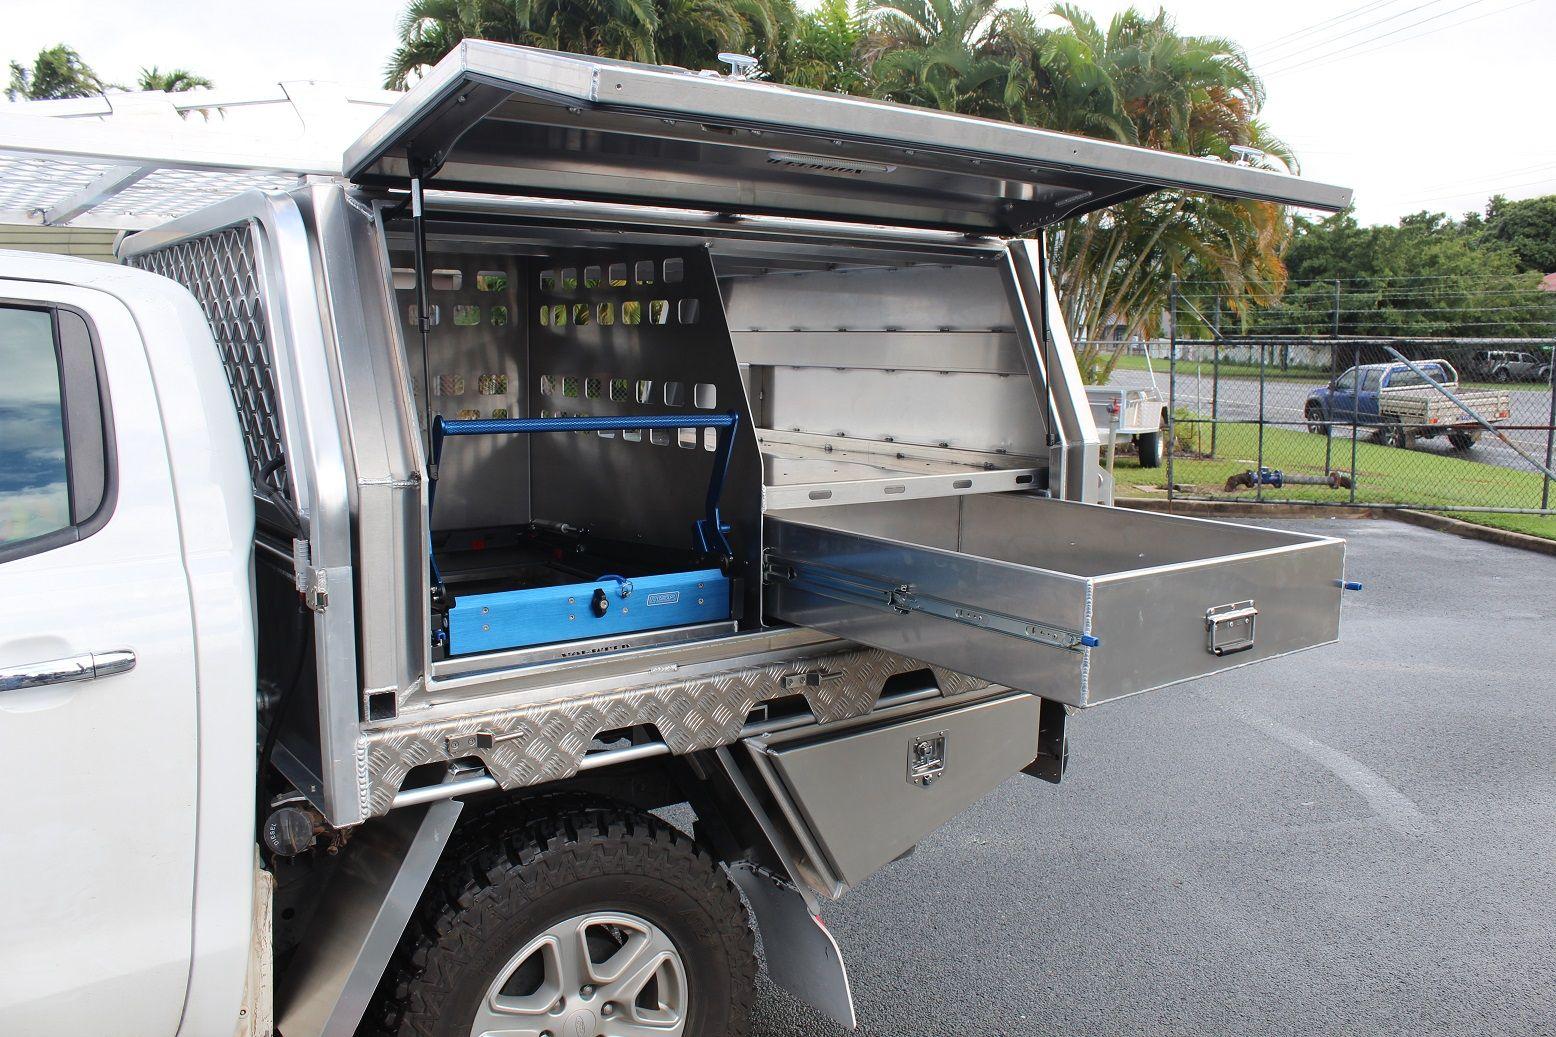 Ford Ranger Aluminium Canopy - Norweld Australia & Ford Ranger Aluminium Canopy - Norweld Australia | Vehicles ...